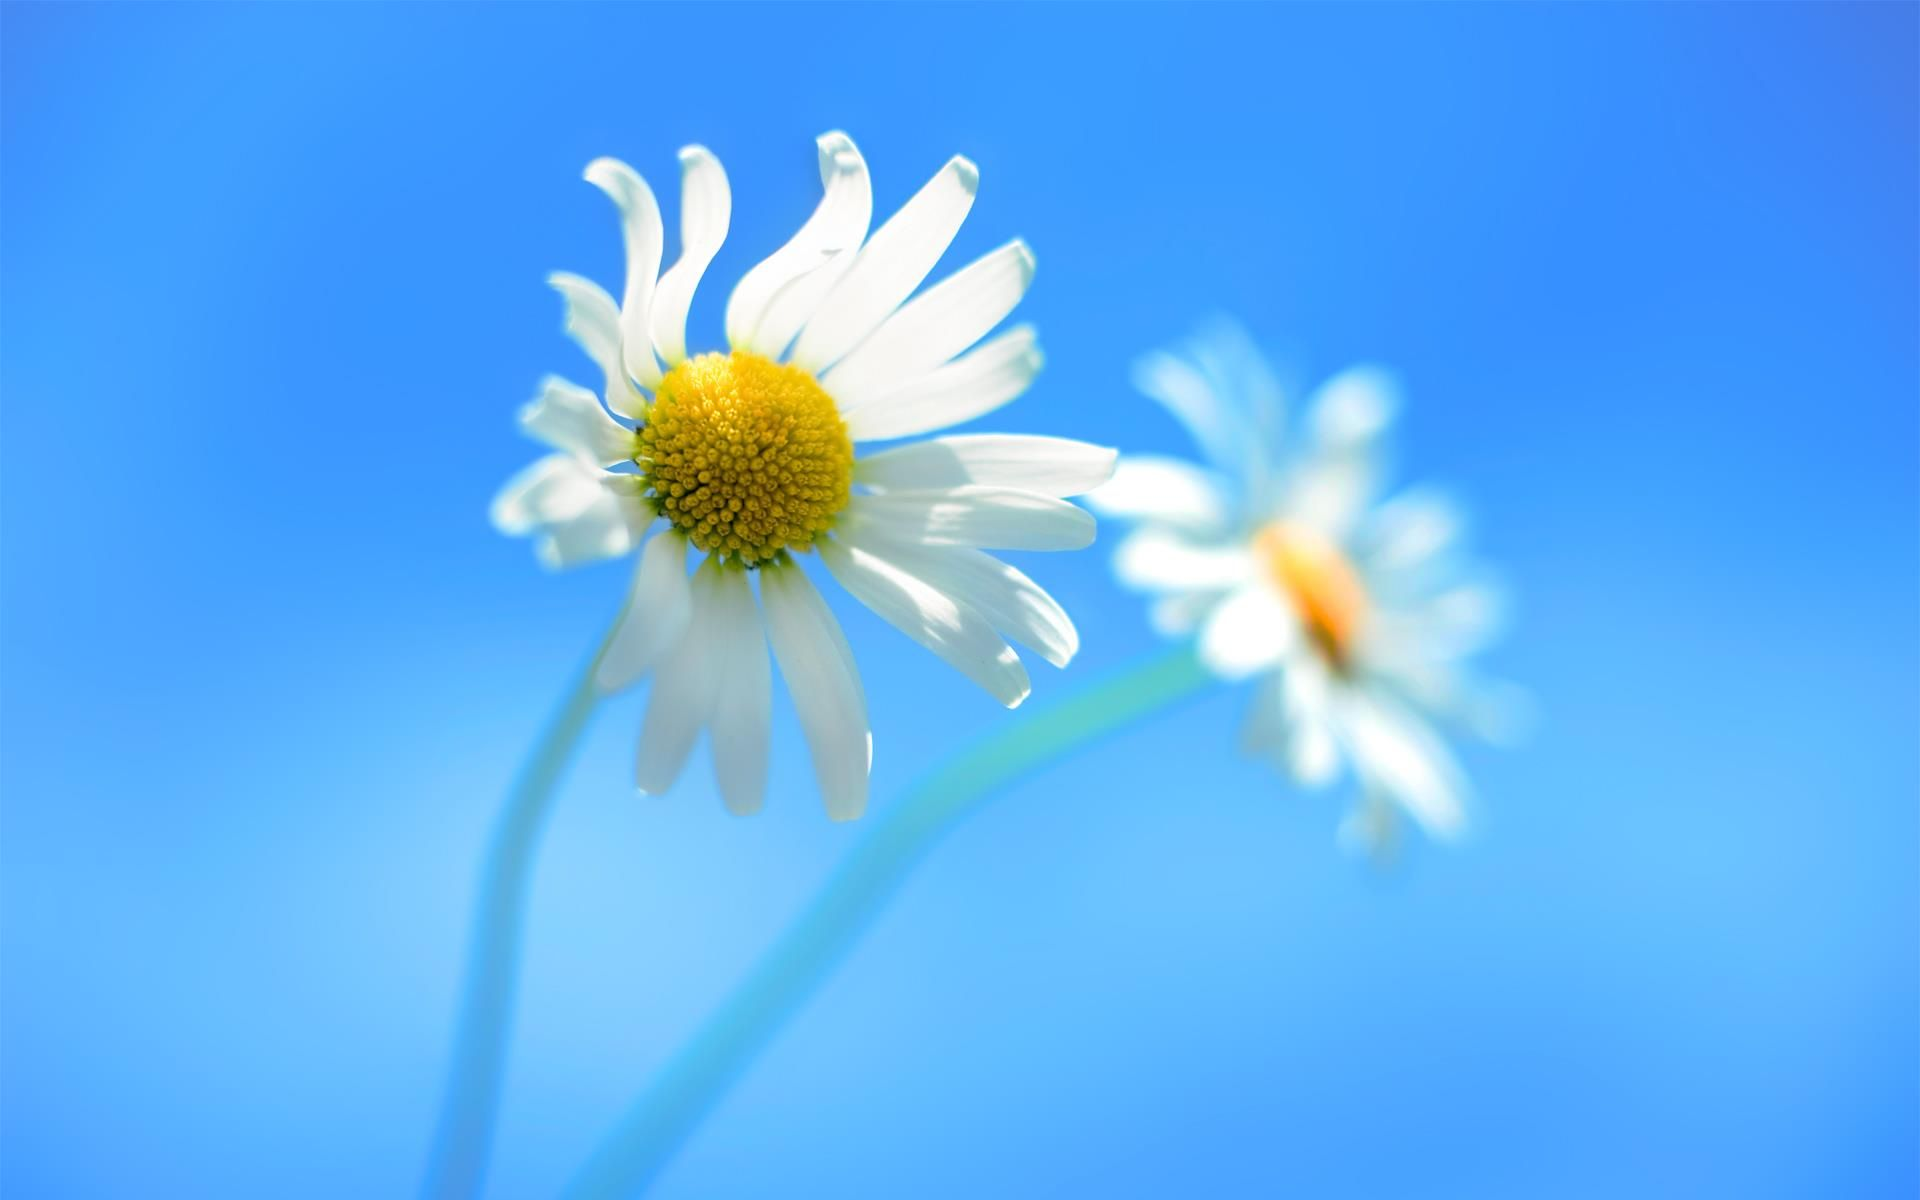 Permalink to Windows 8 Wallpaper Hd 1080p Flower